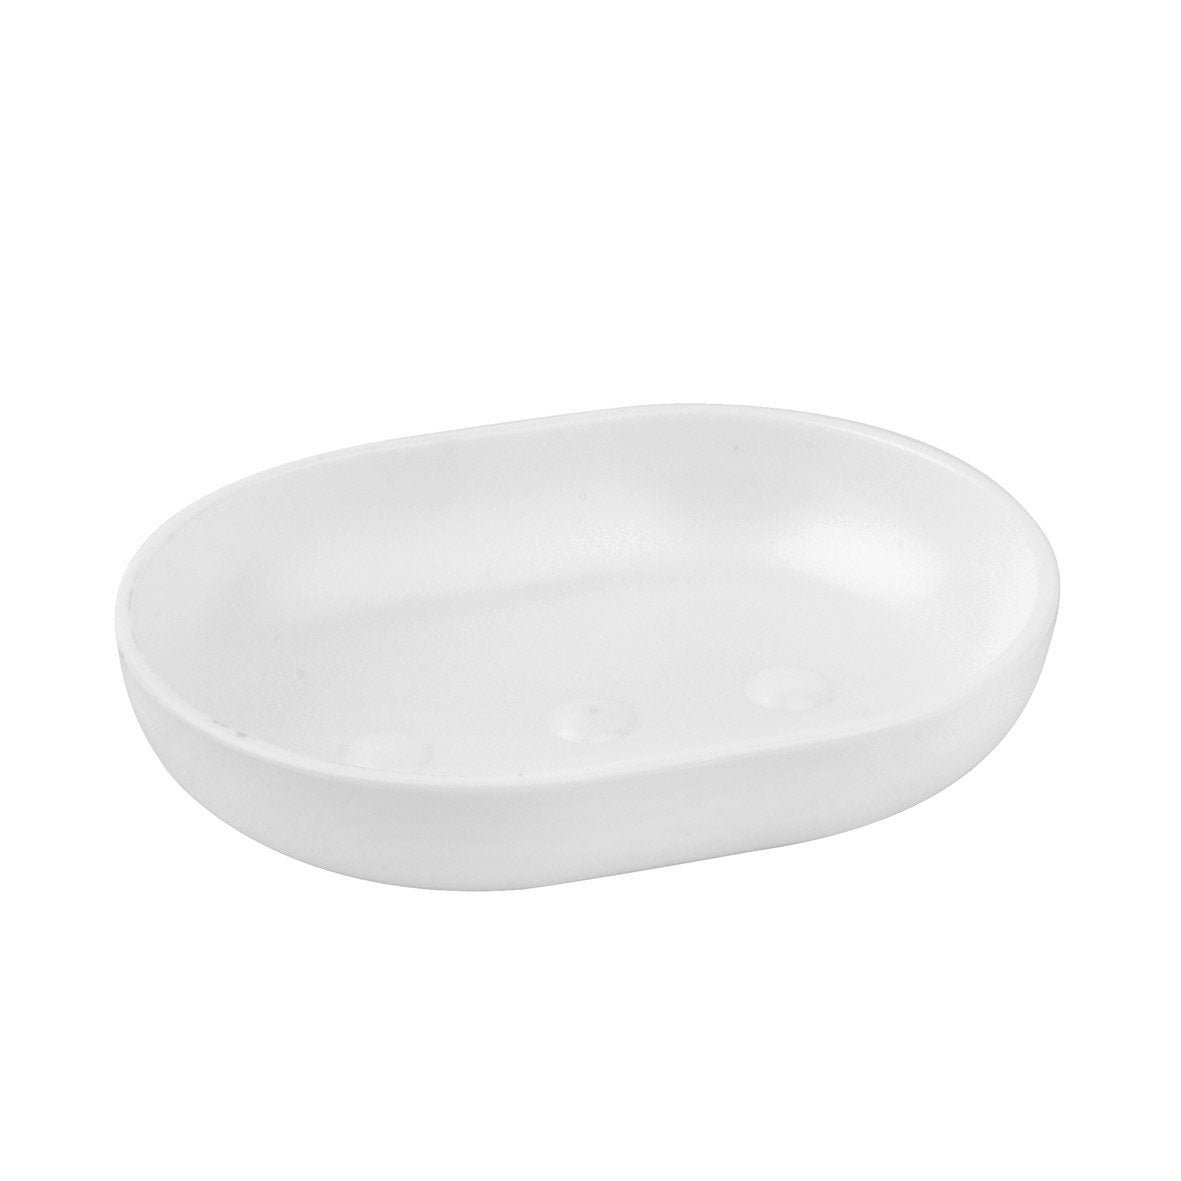 Porte-savon plastique Easy, white n°0